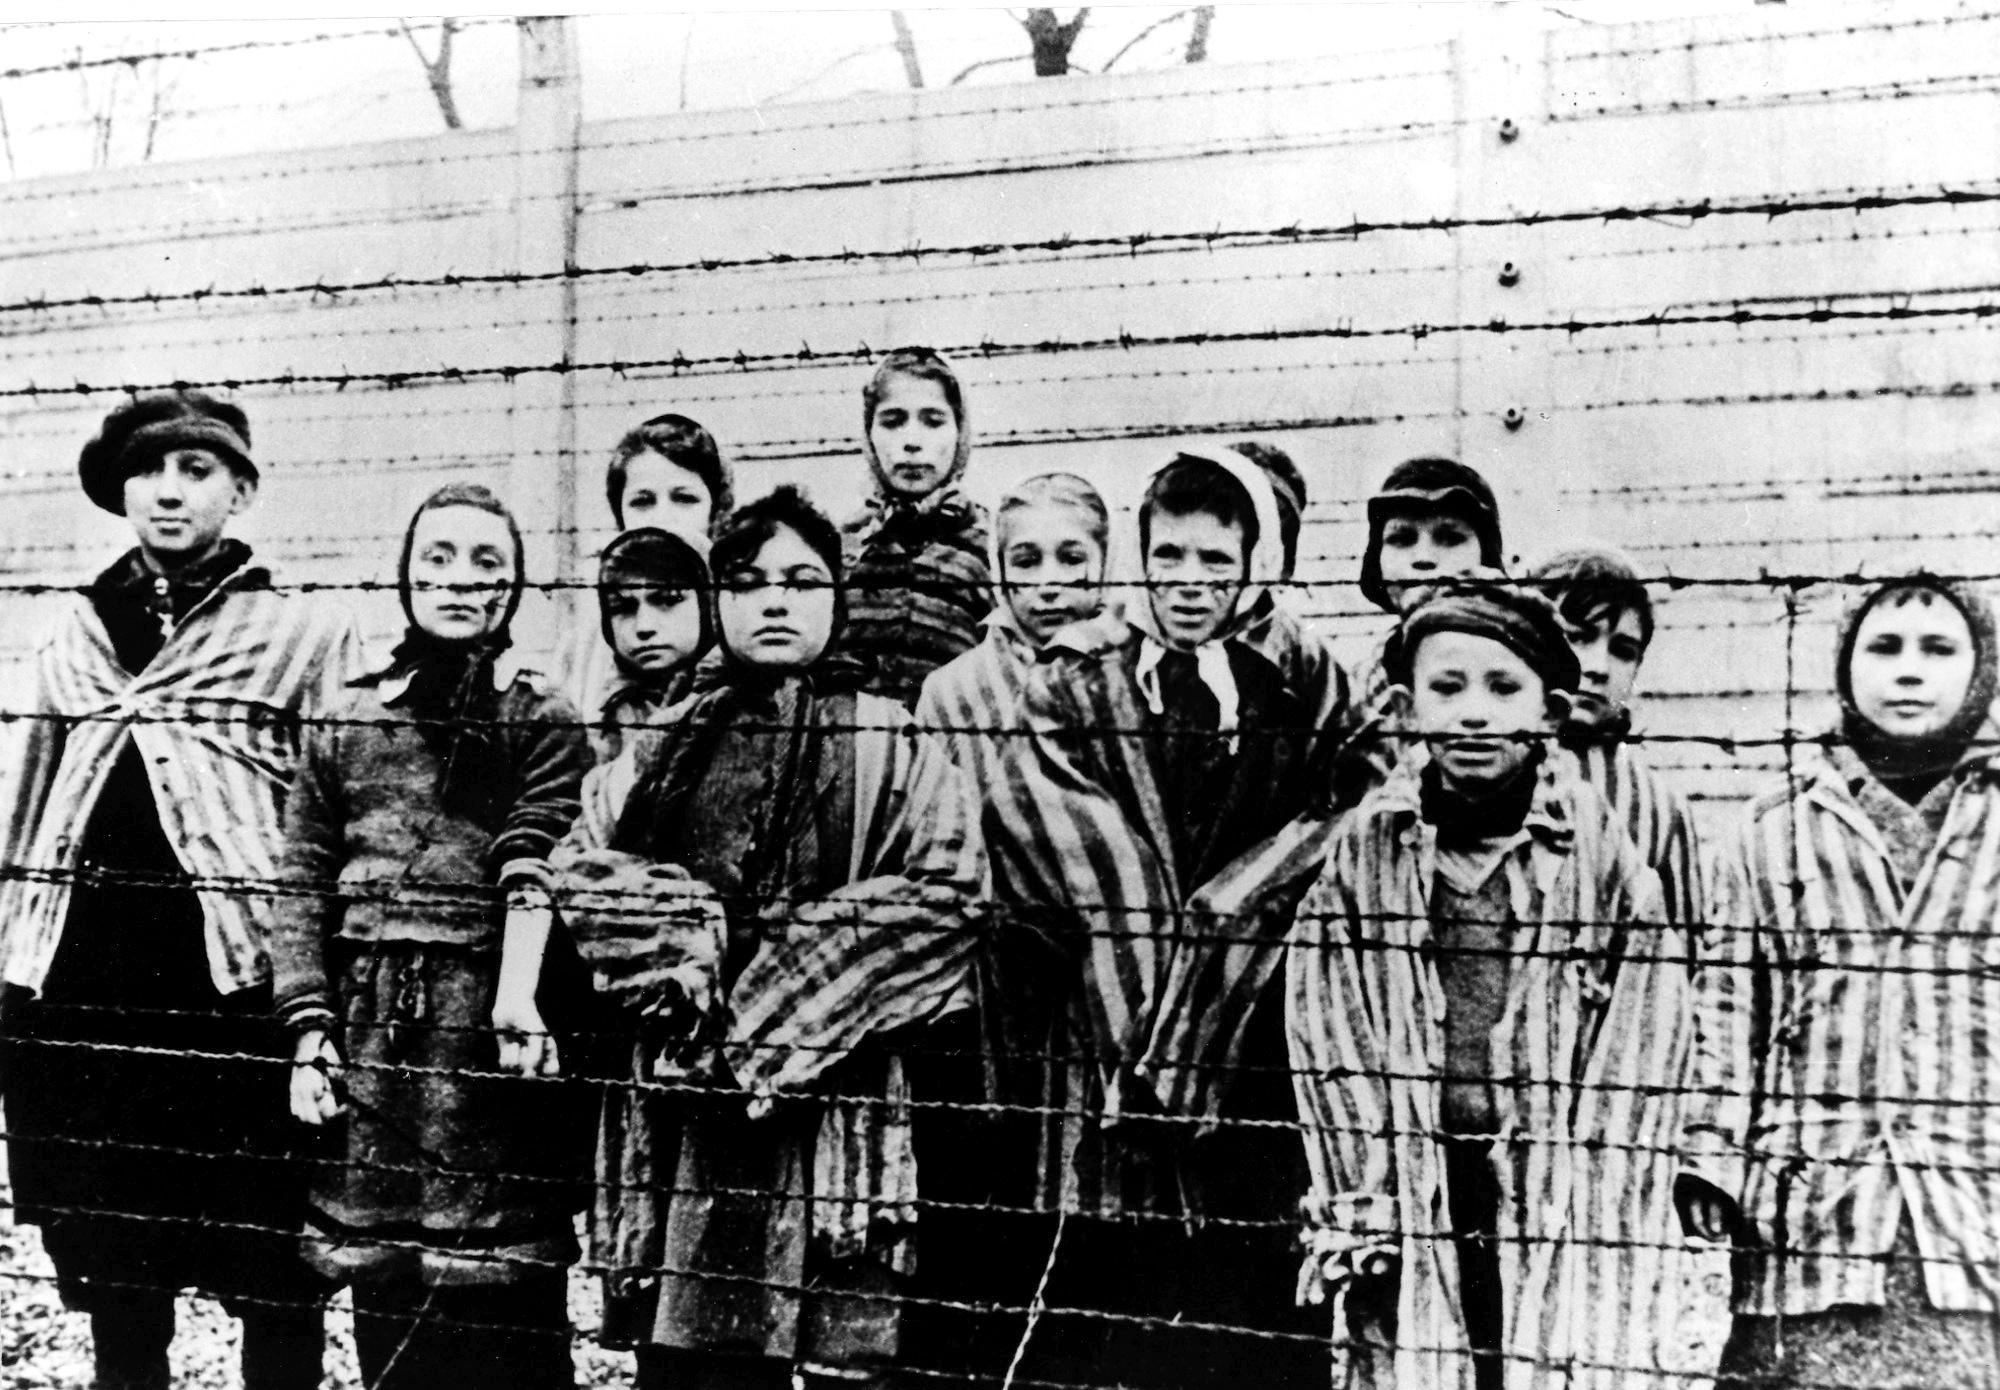 Germany to pay $662 million to aid Holocaust survivors struggling amid pandemic | KTLA